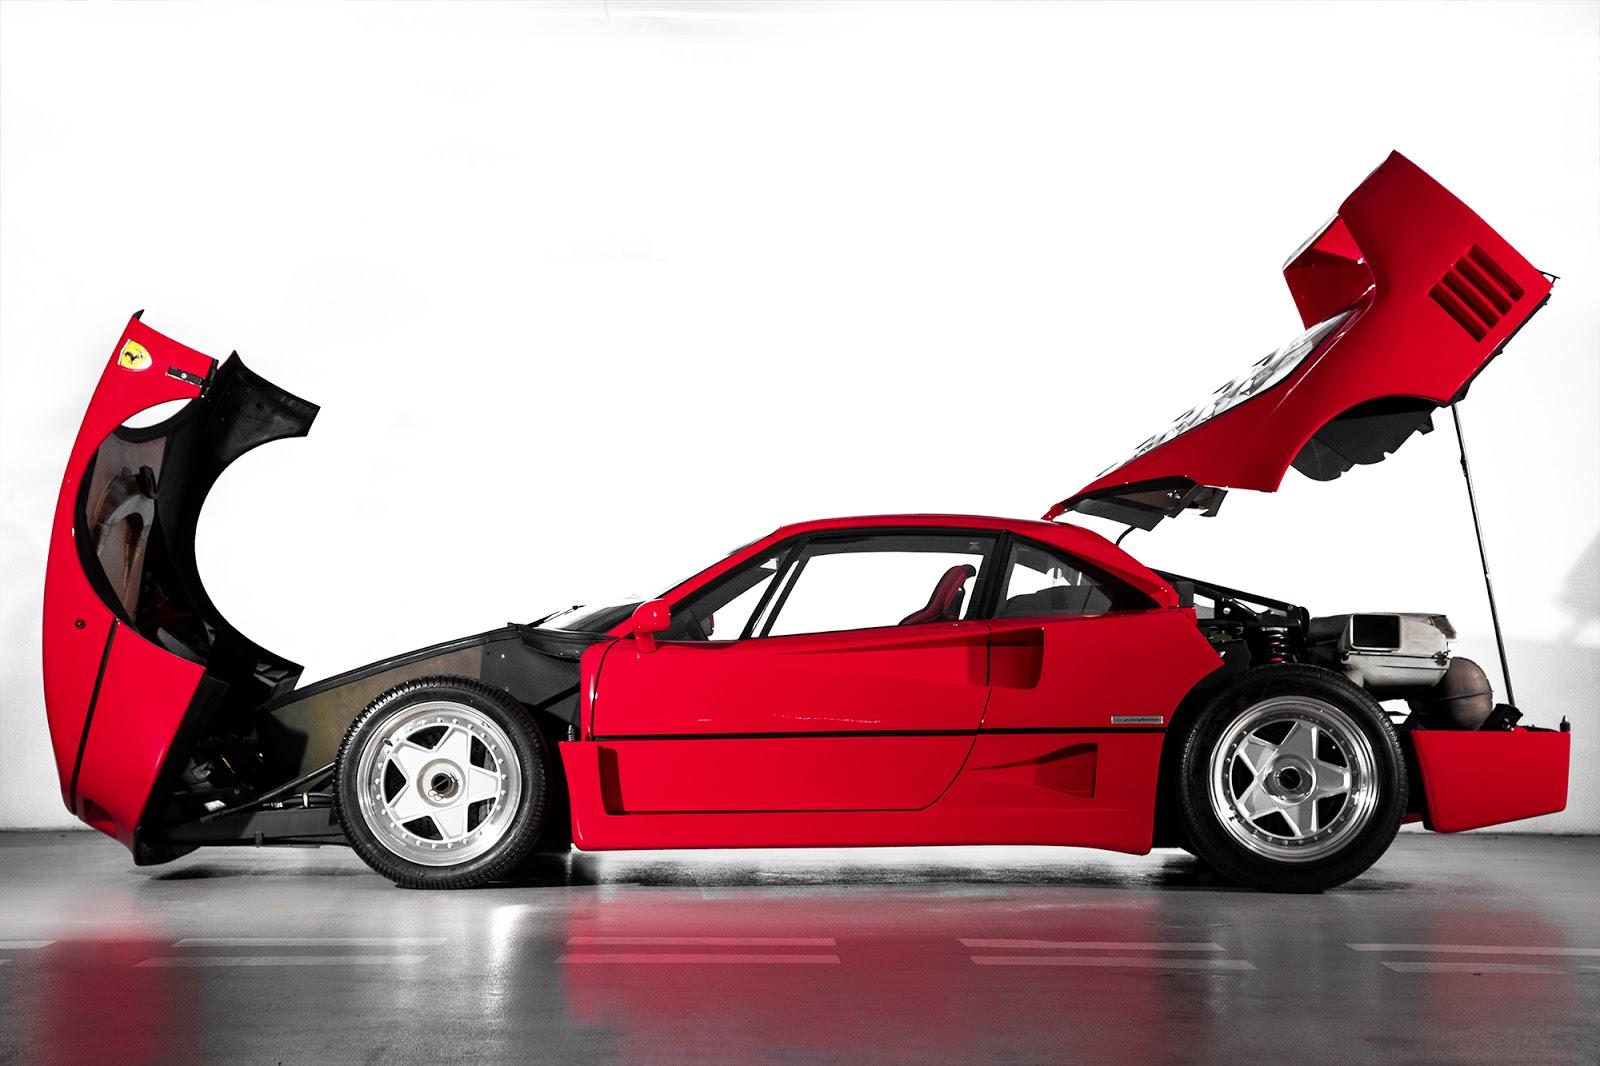 MK5 4890 F40. O μύθος, ο θρύλος F40, Ferrari, Ferrari F40, retrocar, retrocar sunday, zblog